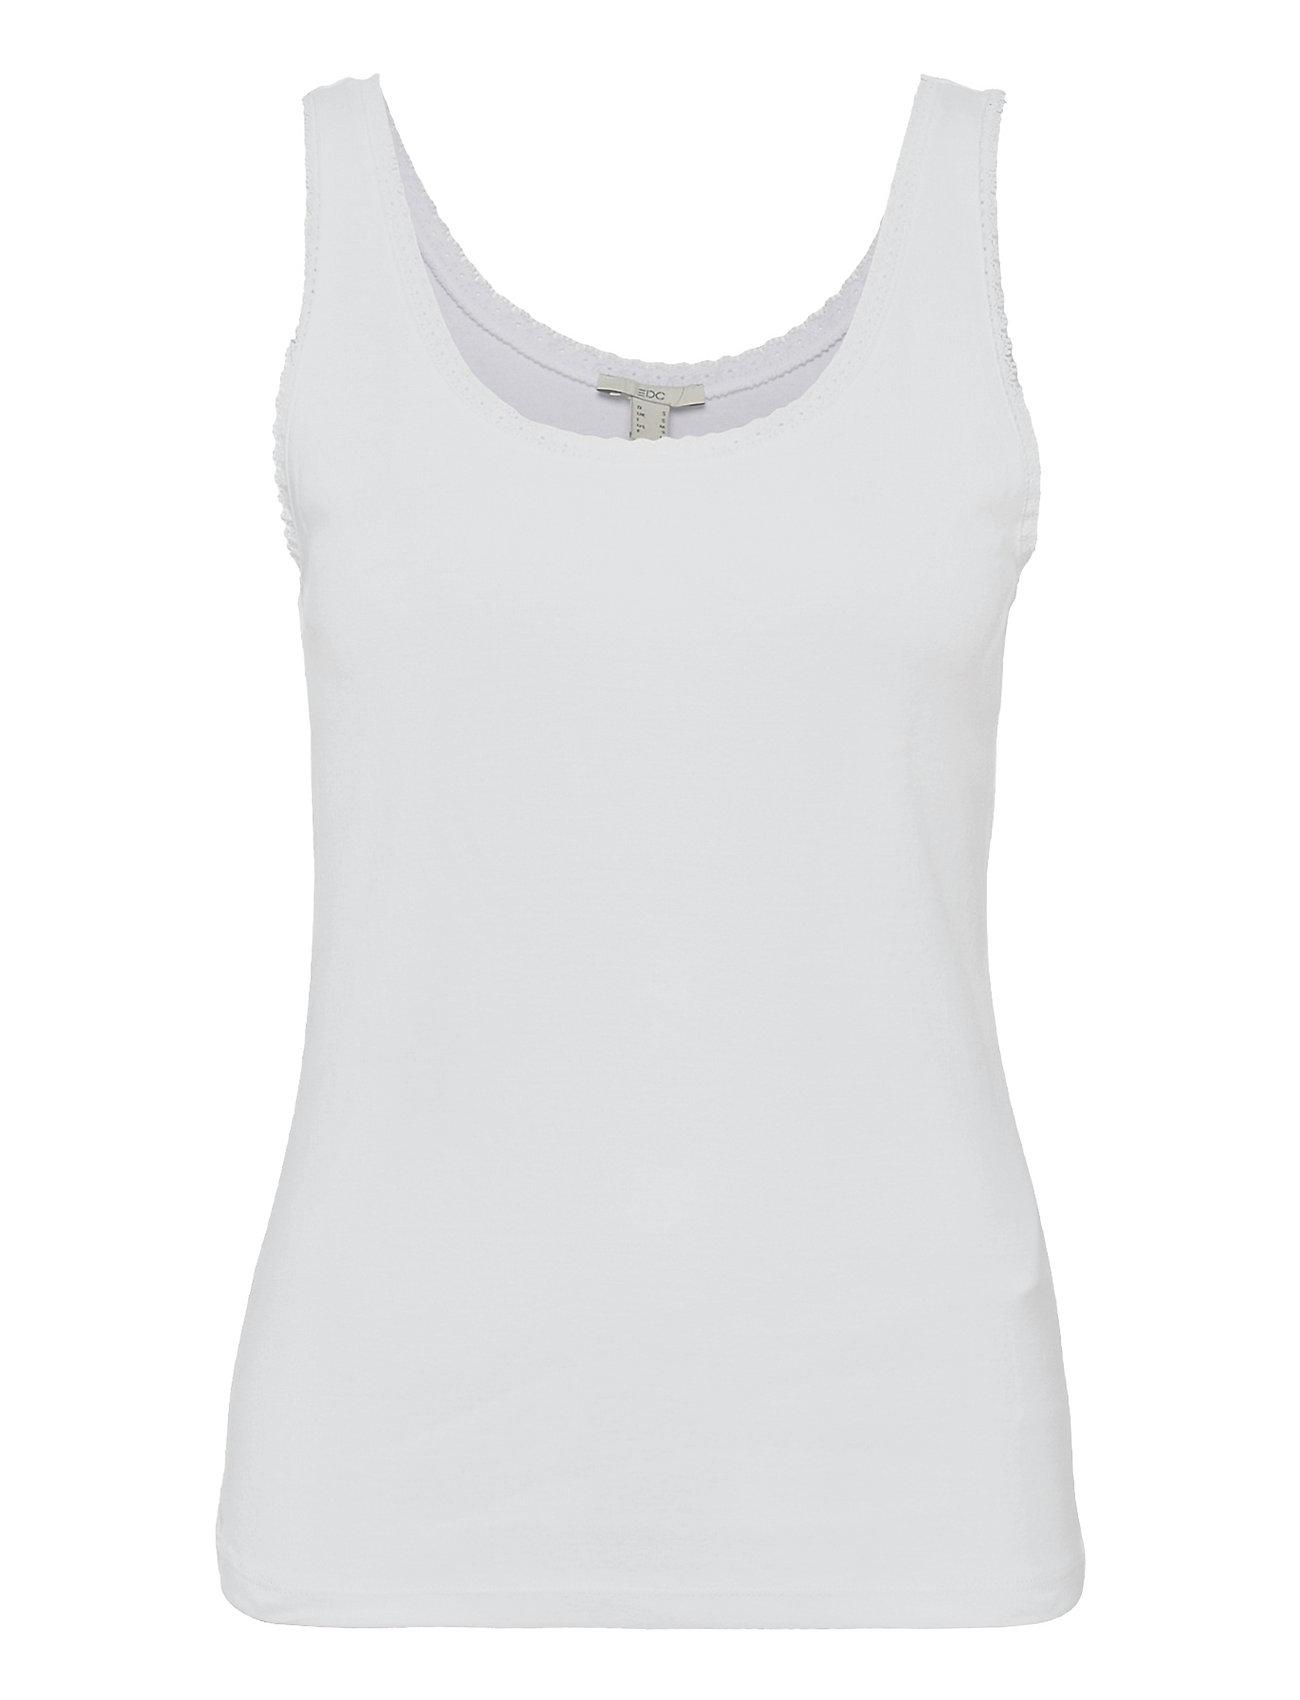 T-Shirts Top Ærmeløs Top Hvid EDC By Esprit